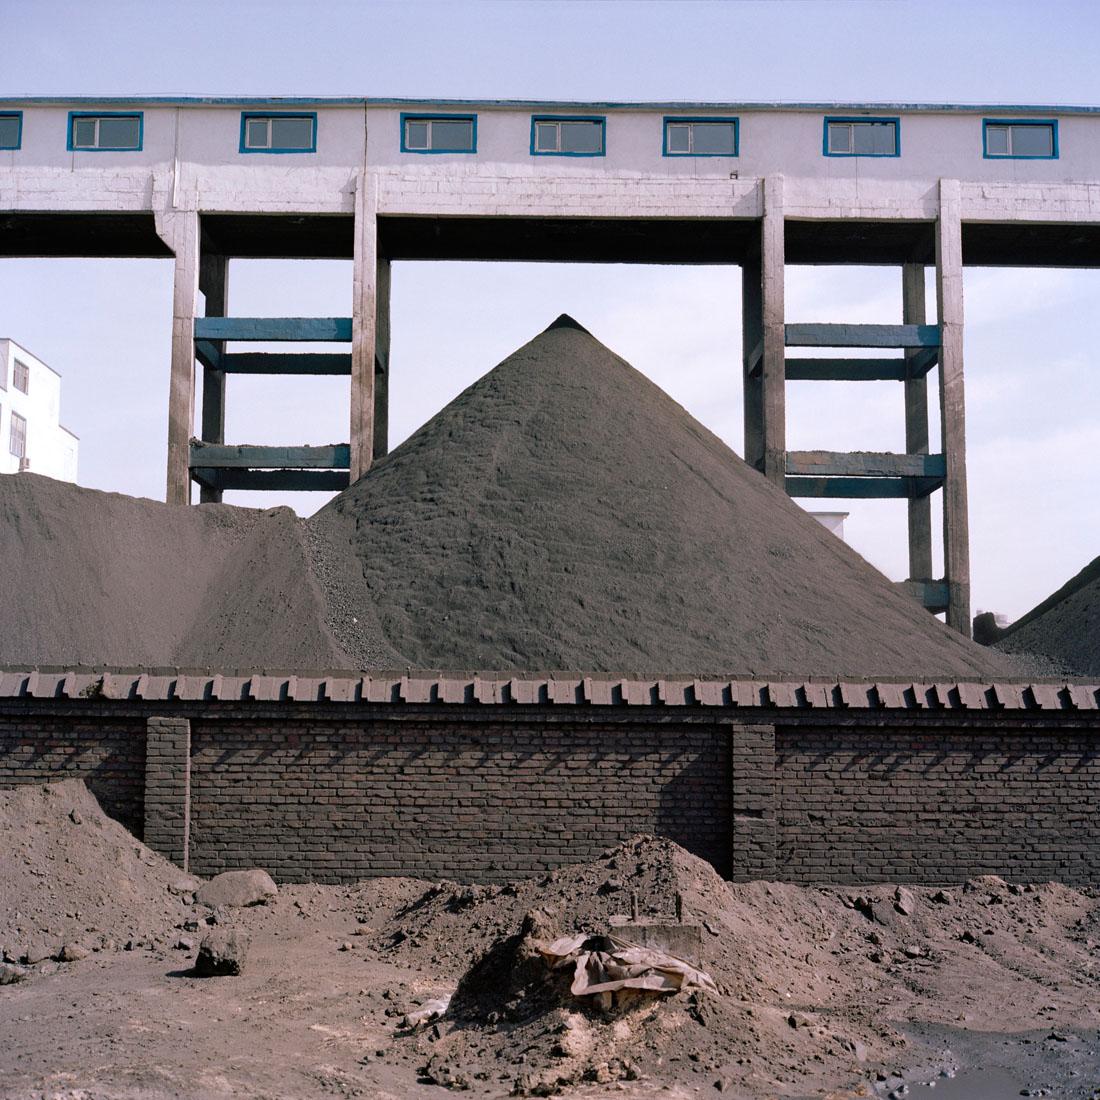 China, Binnen Mongolie, Wuhai, 09-03-2009 China, Inner Mongolia, Wuhai, 09-03-2009 Kolen wasserij op het Hainan district Xi Lai Feng Industry Park. PHOTO AND COPYRIGHT ROGER CREMERS